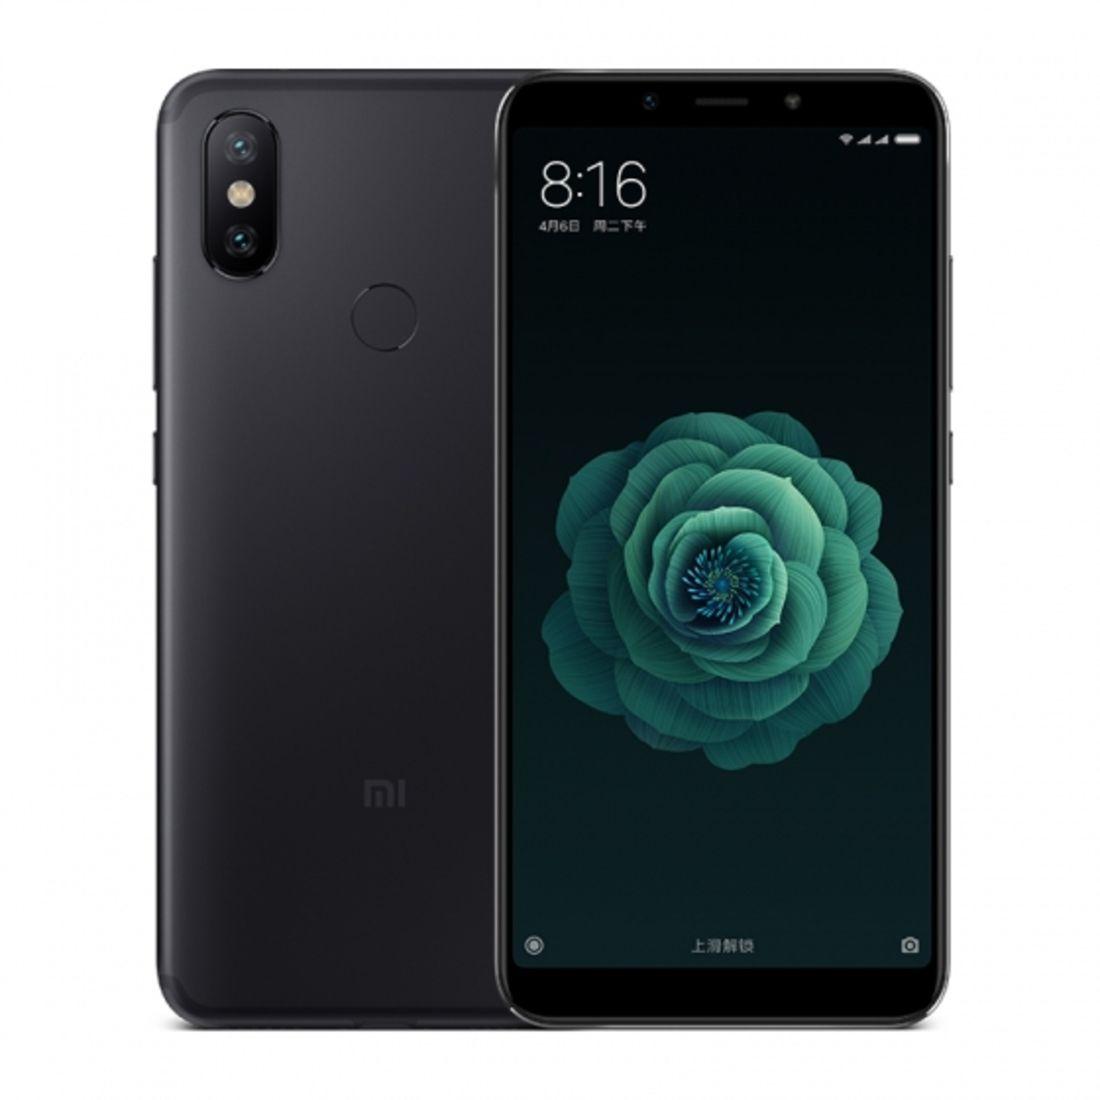 Smartphone Mi A2 4GB Ram Tela 5.99 32GB Camera Dupla 12+20MP - Preto